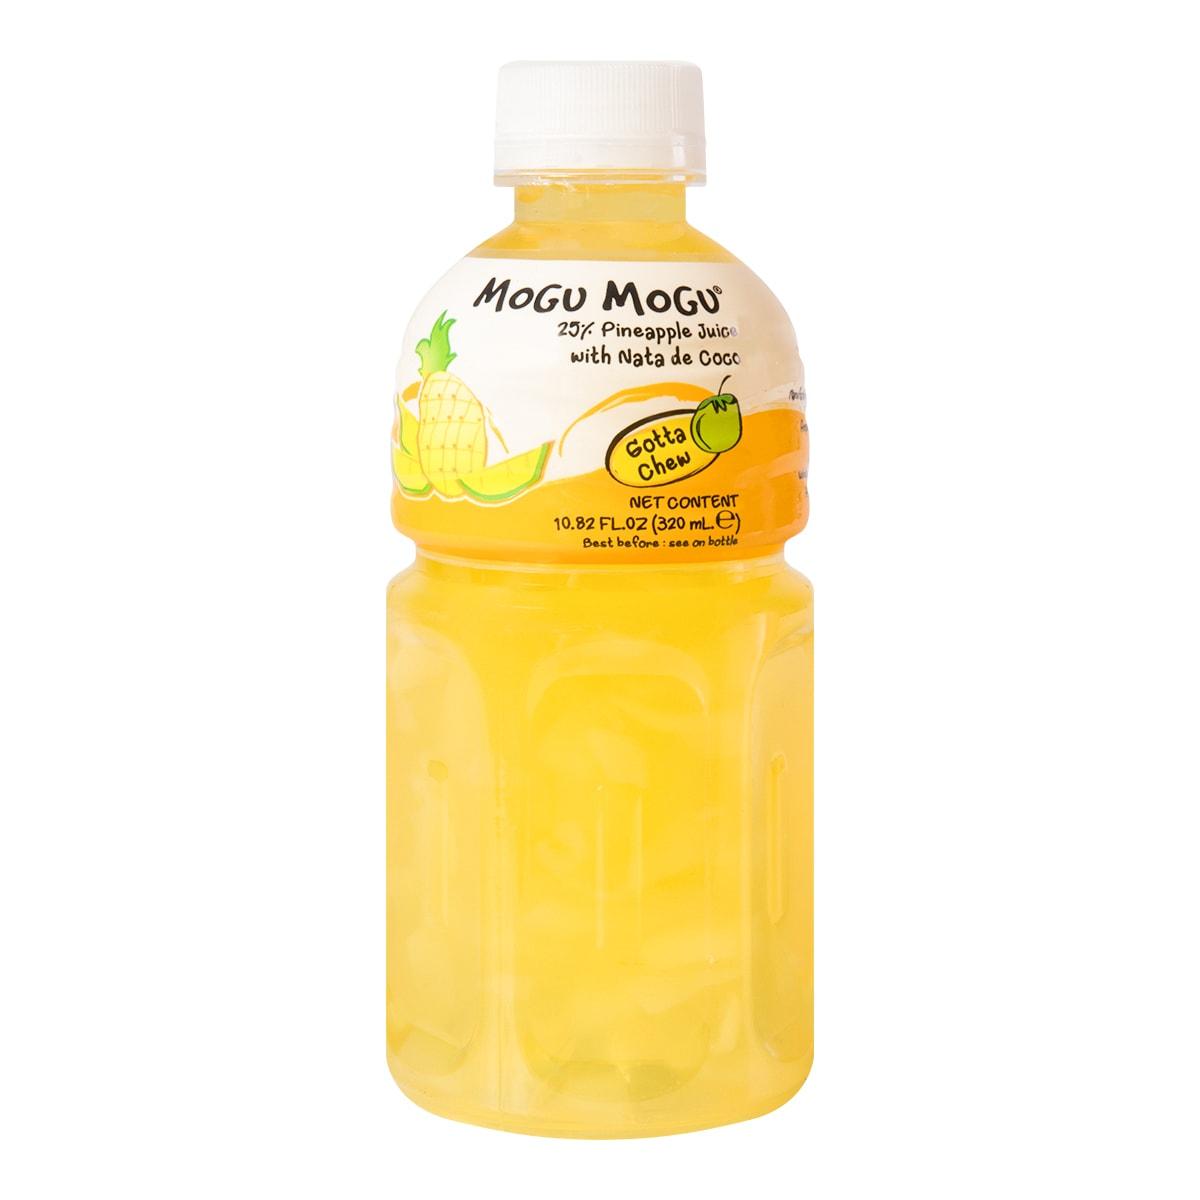 MOGU MOGU Pineapple Flavored Drink With Nata De COCO 320ml